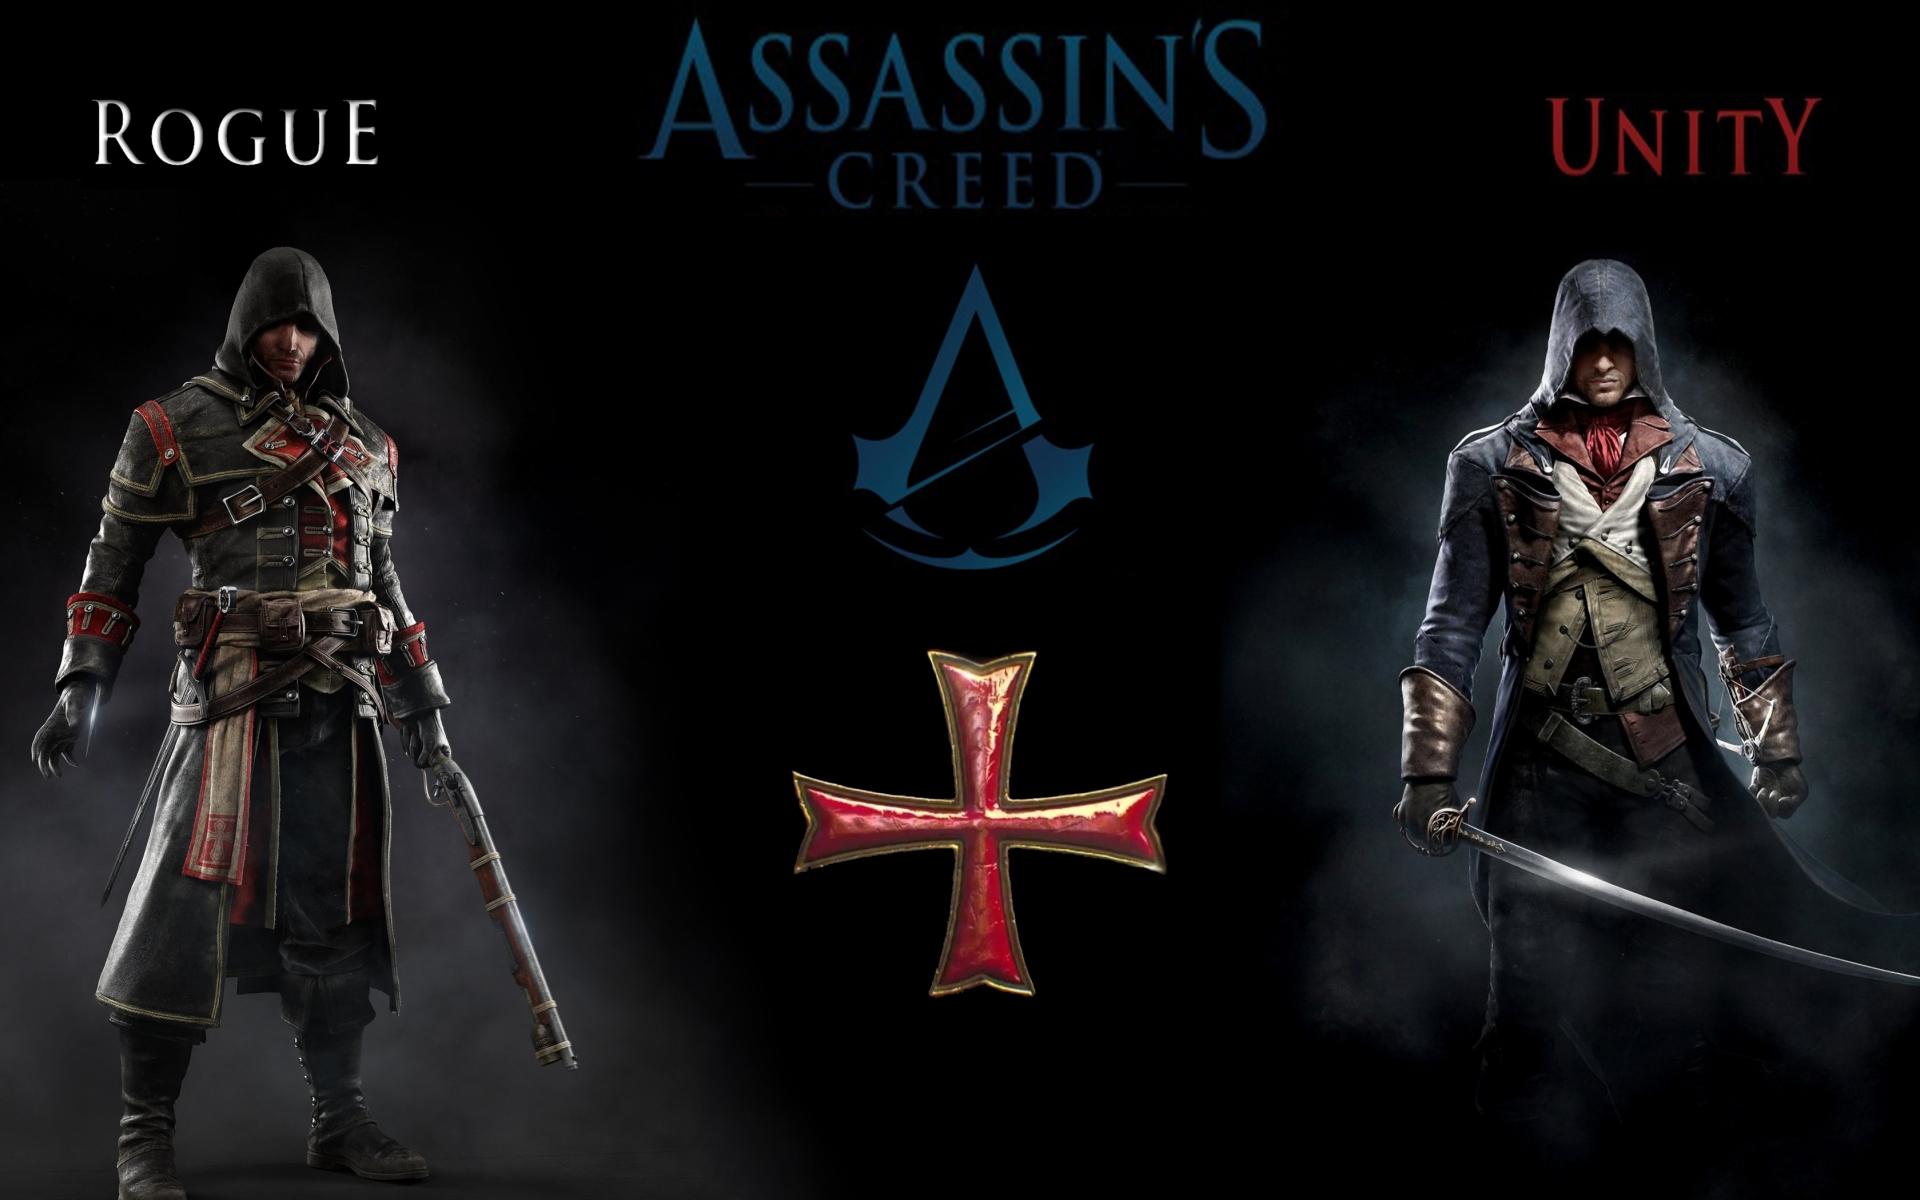 Wallpaper 1080p Assassins Creed Unity Rogue Video Game HD wallpaper 1920x1200